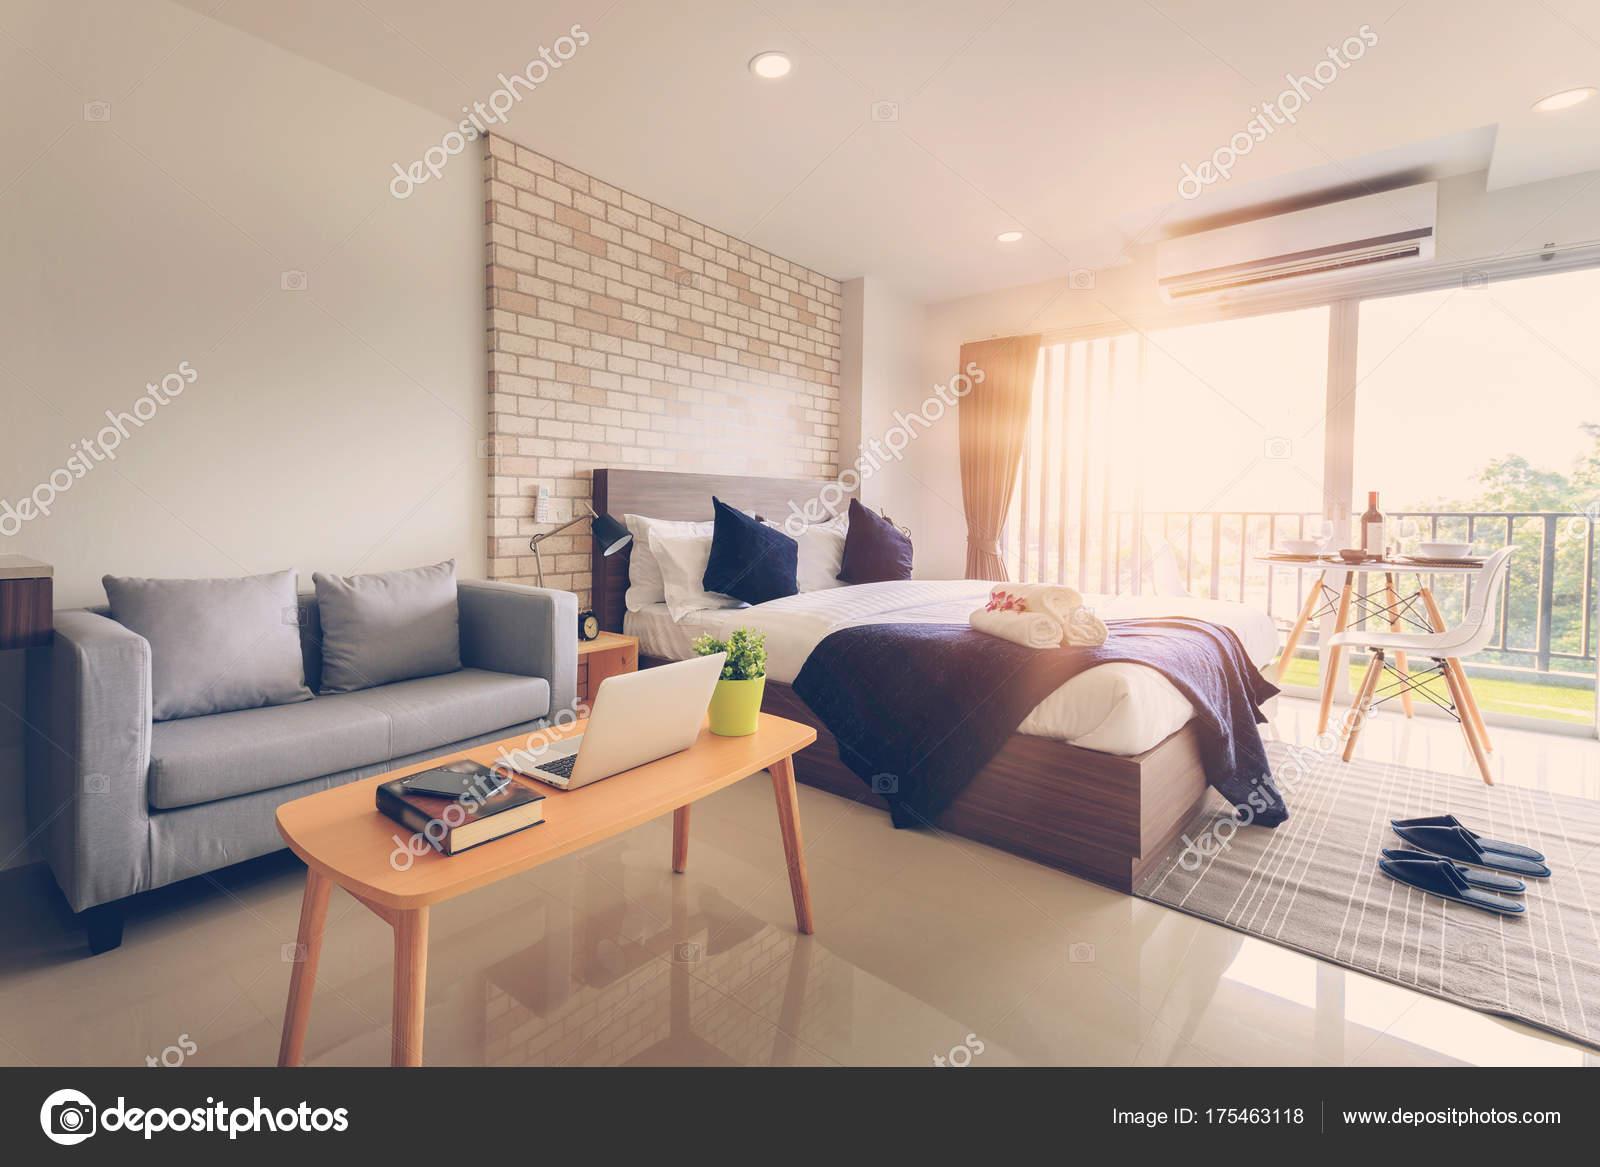 Dise o interiores dormitorios hotel hotel foto de stock for Diseno de interiores dormitorios